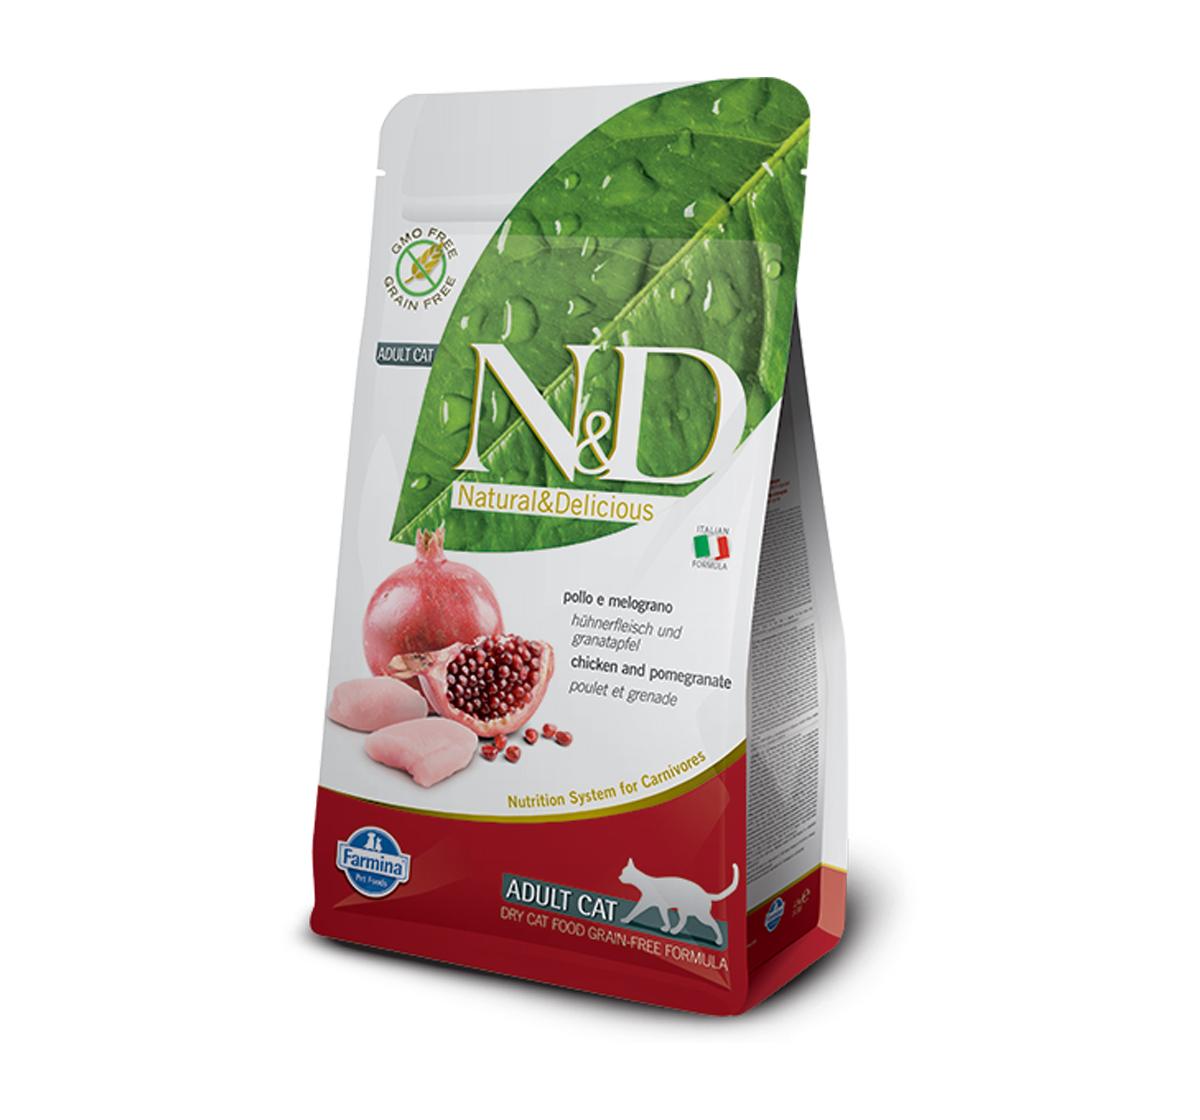 Farmina N&D Dry Cat Food Grain Free Chicken & Pomegranate Adult Cat - 5 Kg (Pack Of 2)